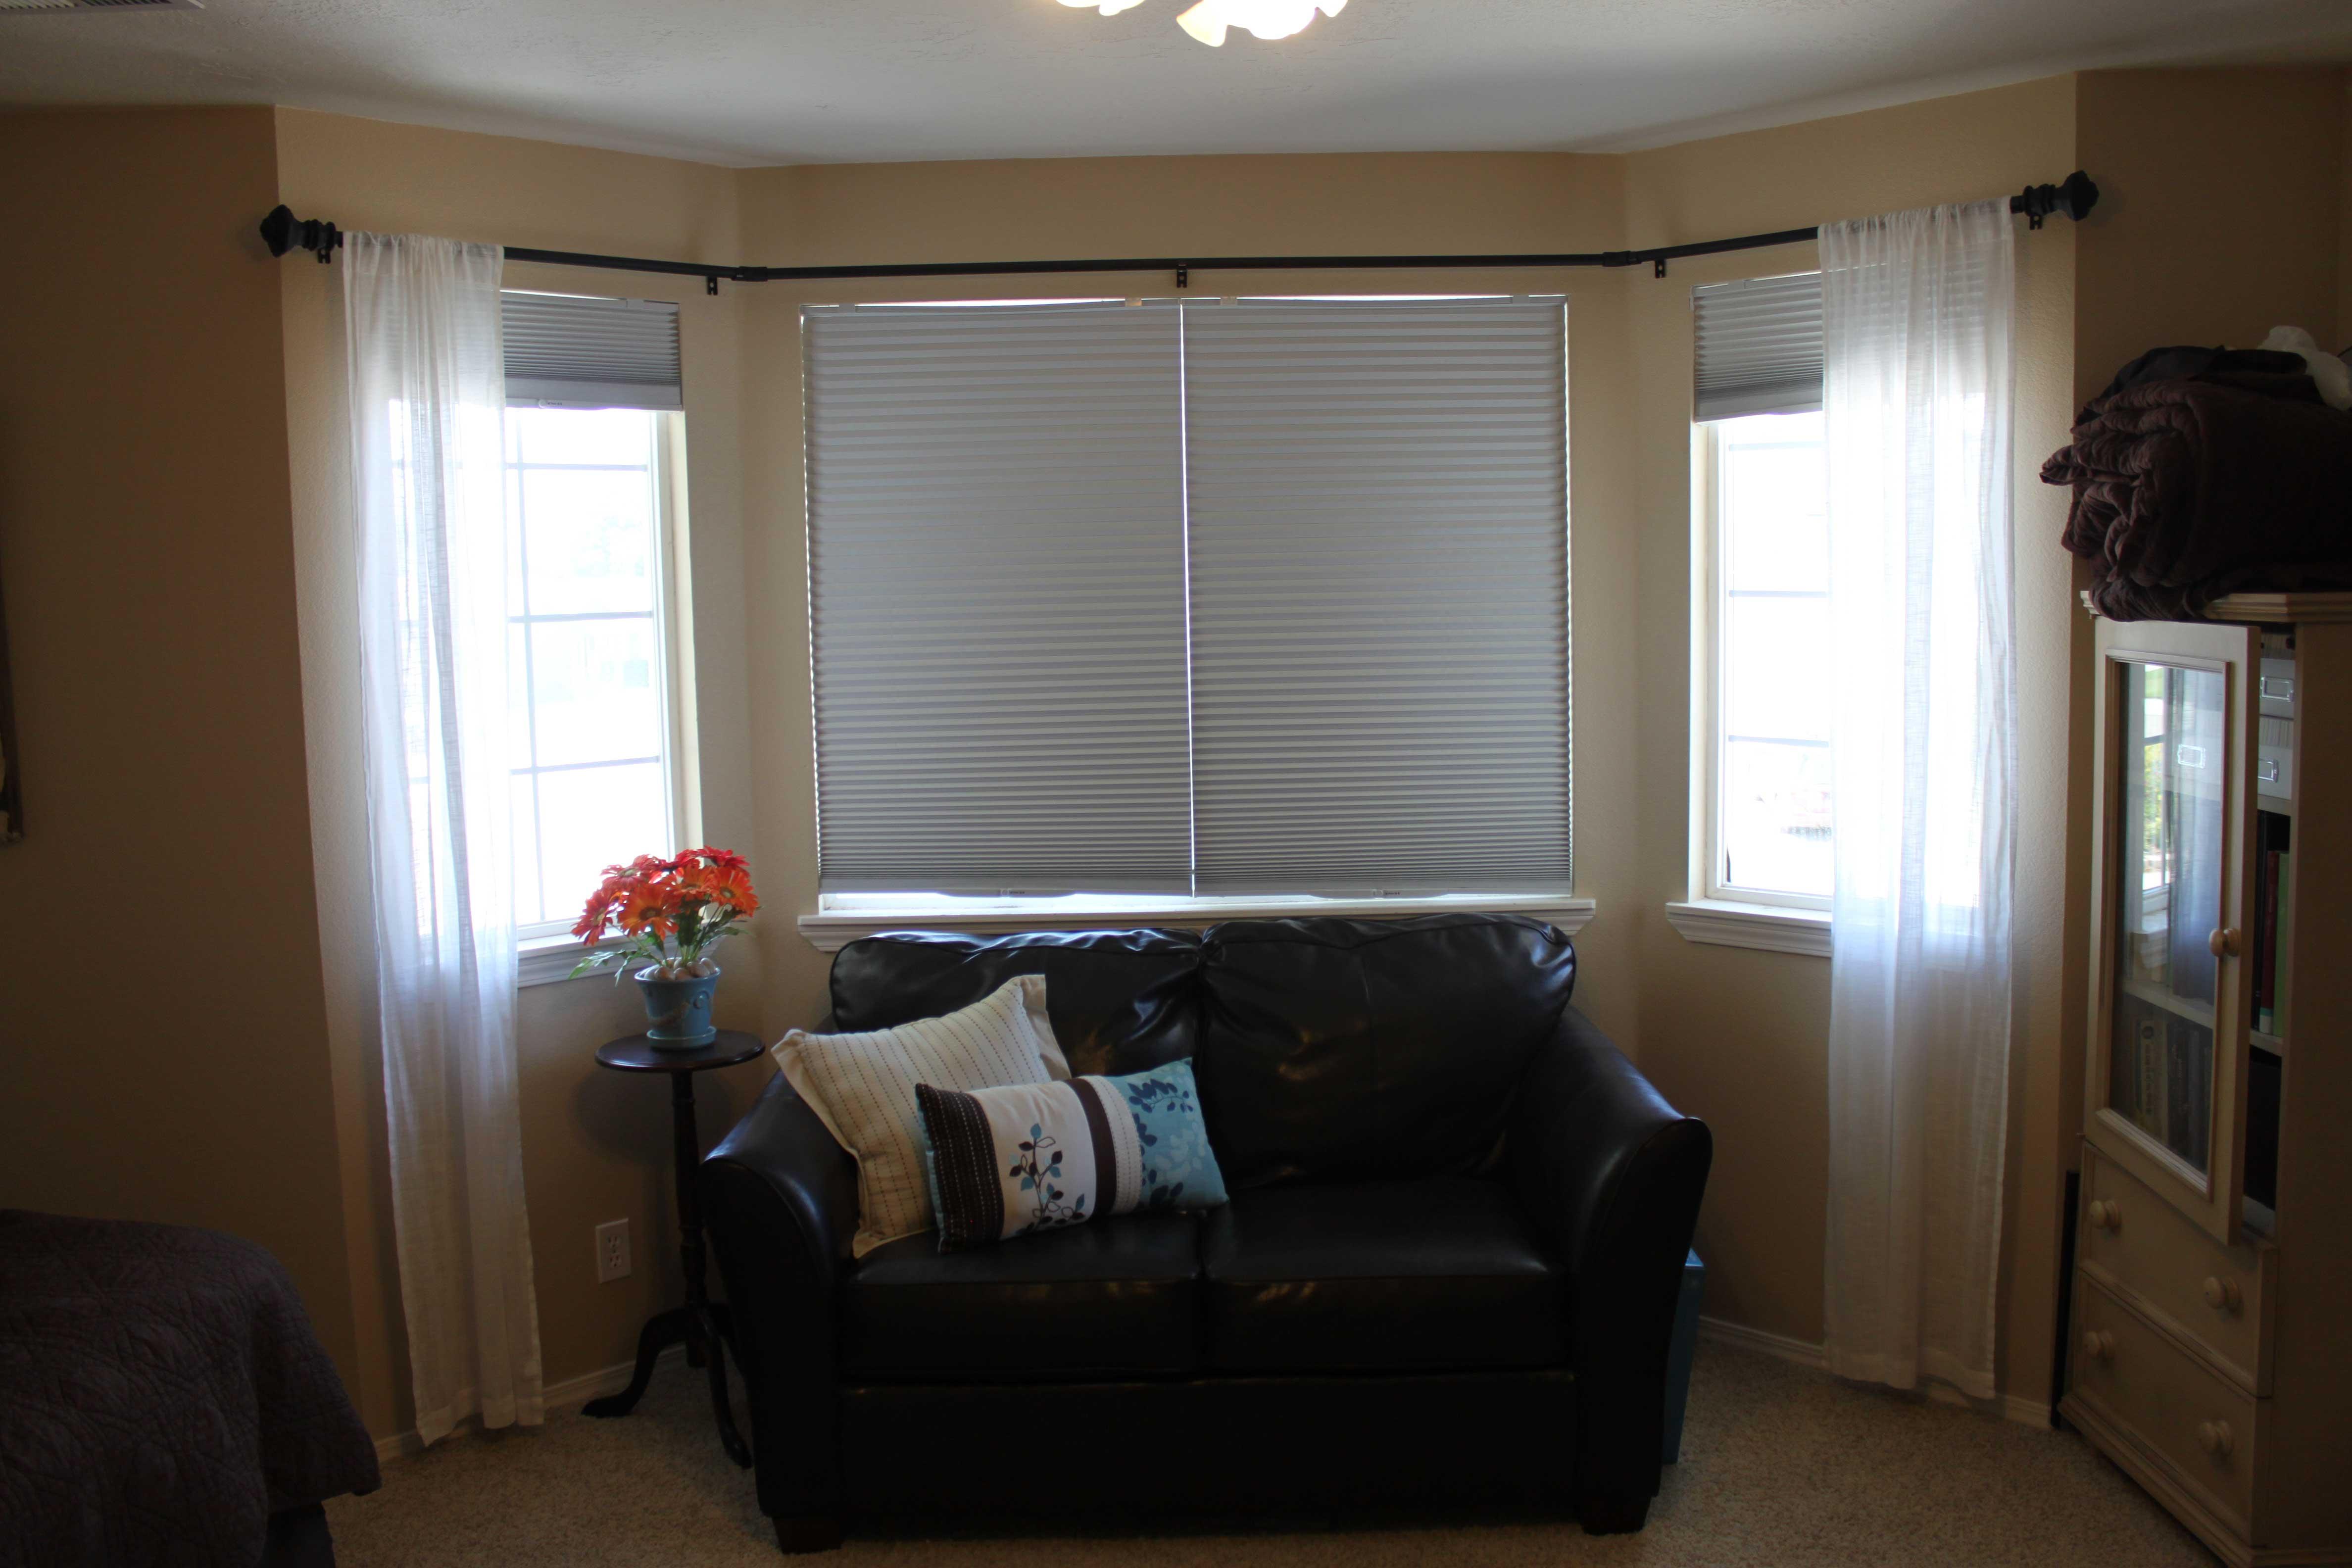 curtain rods for bay windows homesfeed curtains and shades with curtain rods for bay windows near leather sofa